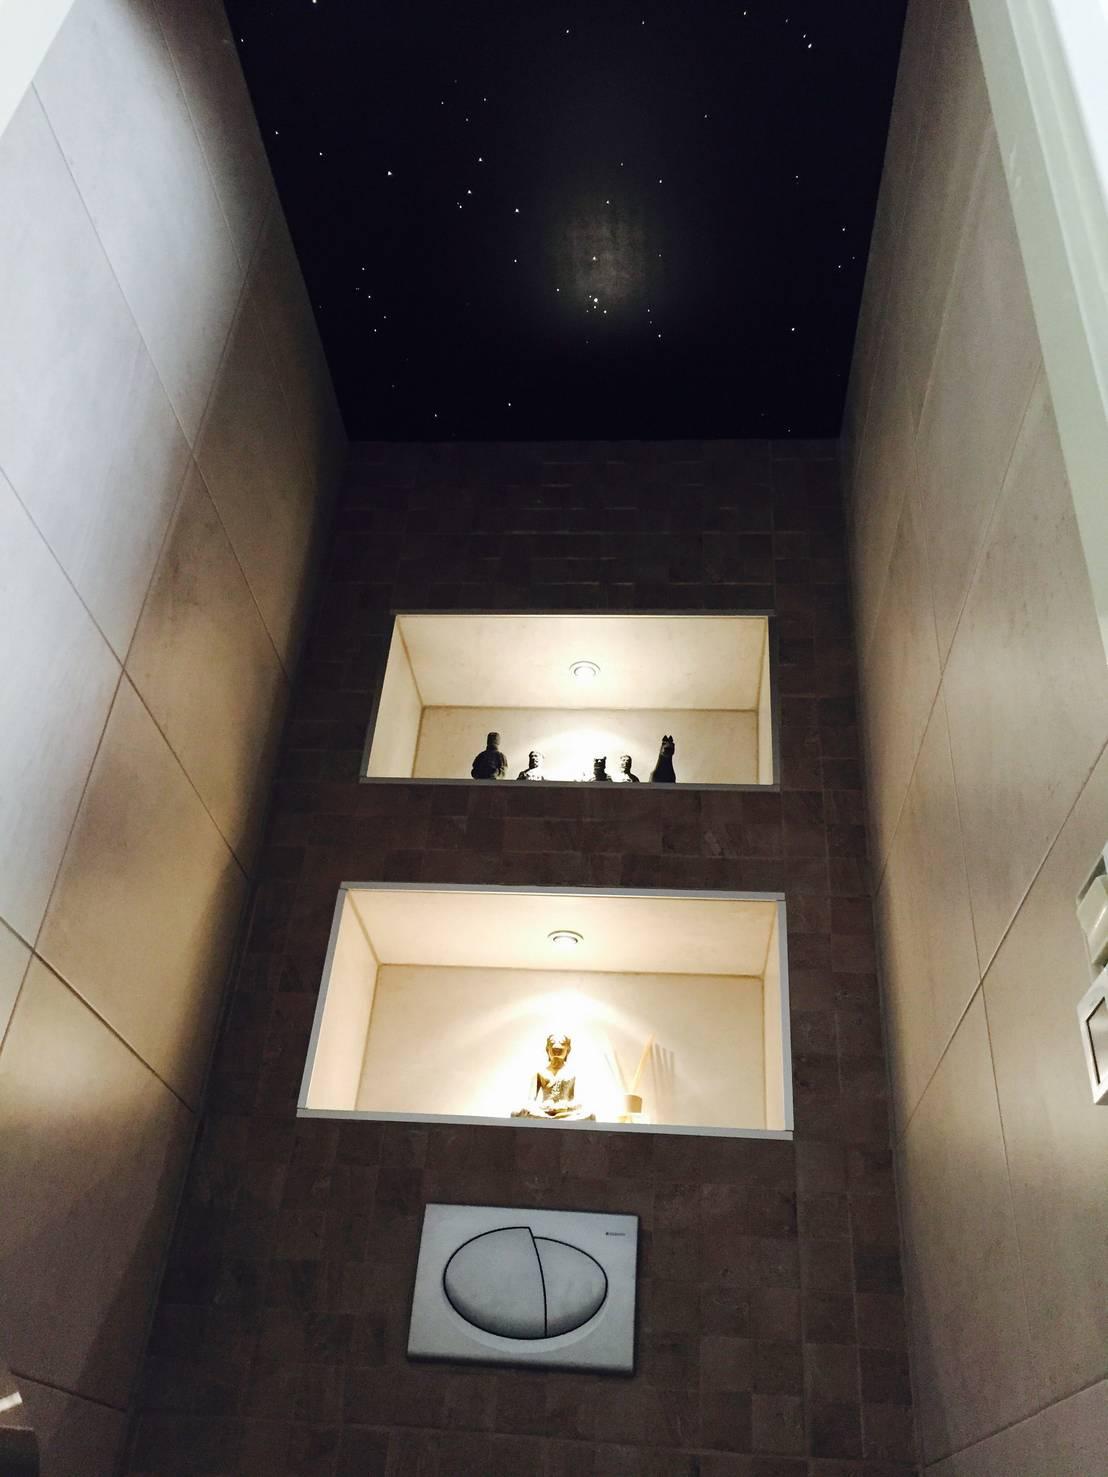 https://images.homify.com/image/upload/a_0,c_fit,f_auto,q_auto,w_1108/v1441127579/p/photo/image/727084/sterrenplafond.nl_wc_sterrenhemel_plafond_verlichting_LED_glasvezel_star_ceiling_panels_stars_on_the_ceiling.jpg